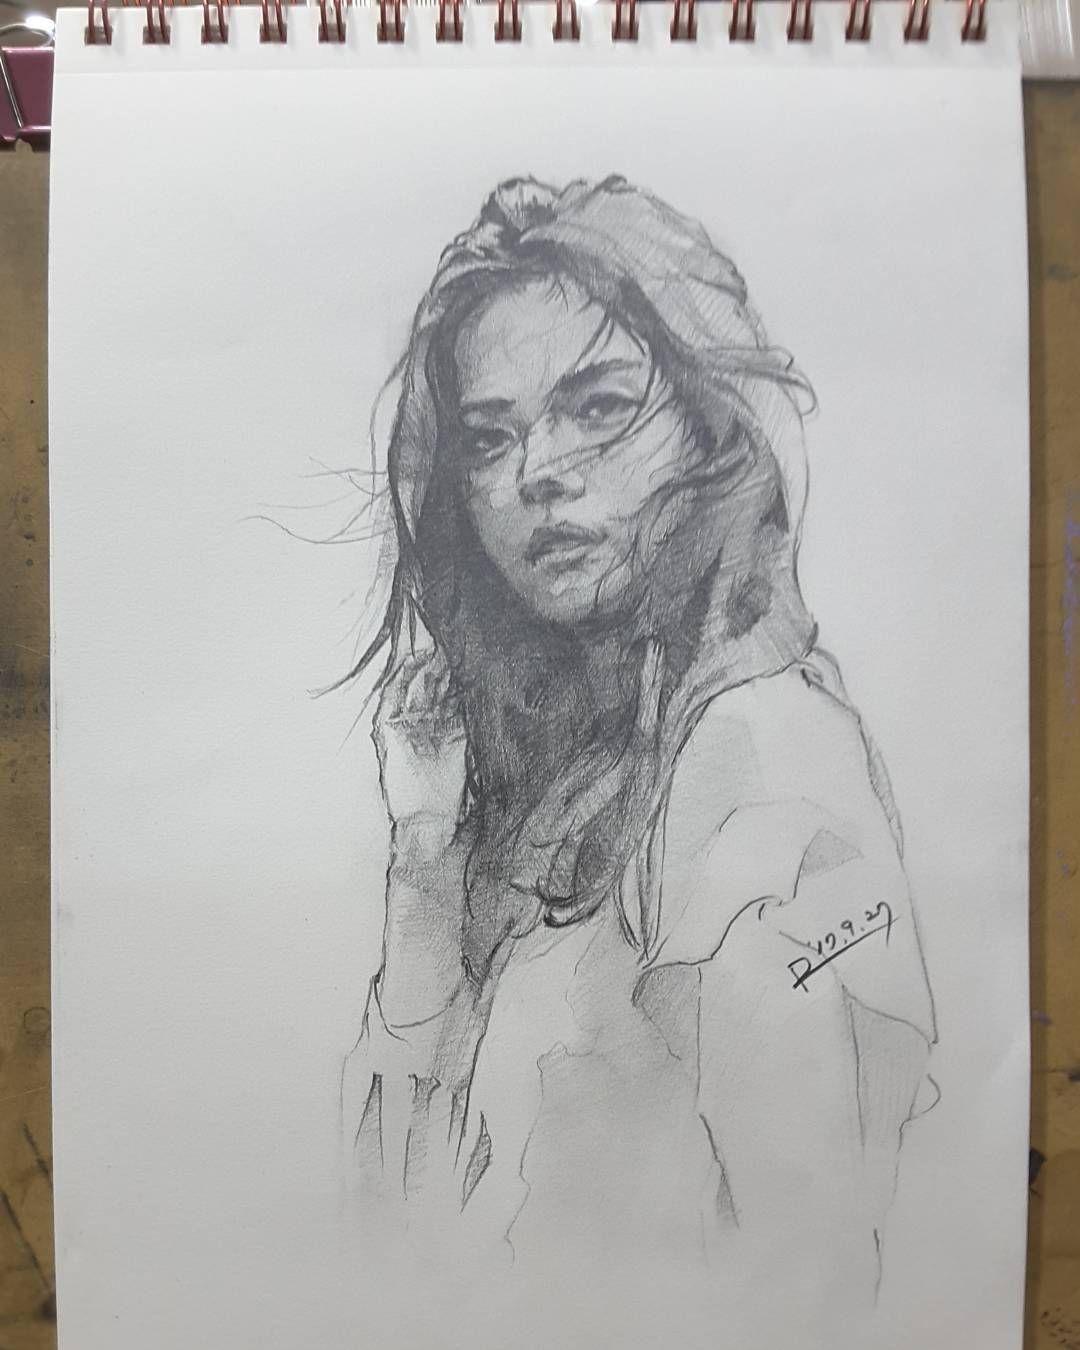 4b charcoal draw drawing sketch artwork pencil doodle art 드로잉 스케치 연필스케치 손그